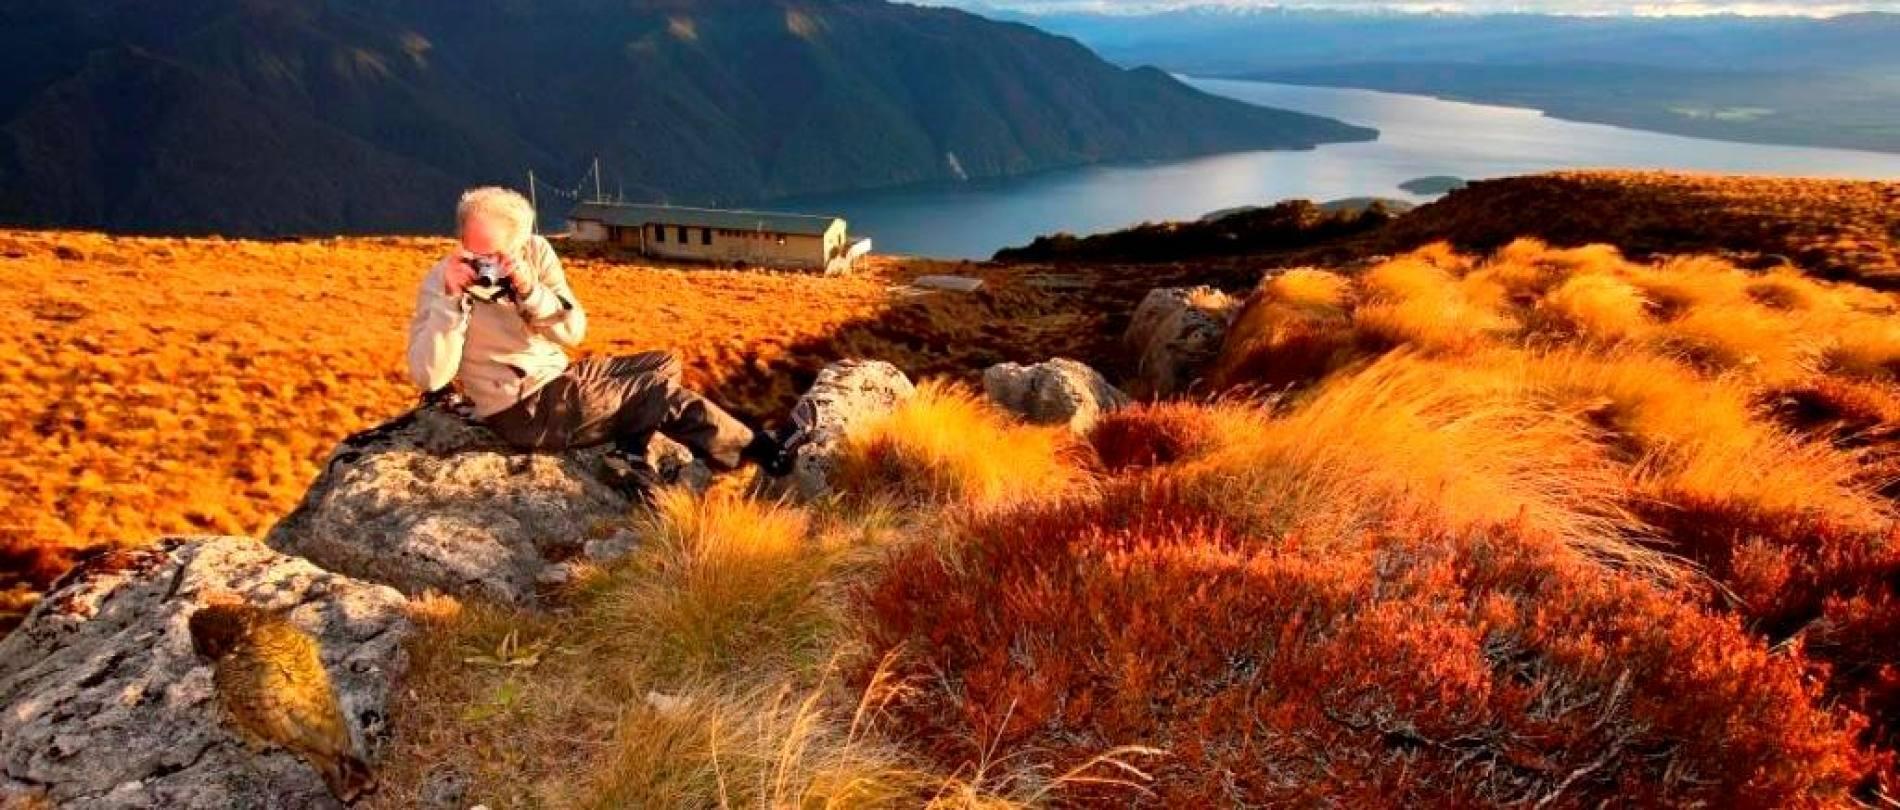 Te Anau Hotels In New Zealand Luxury Hotels Fiordland